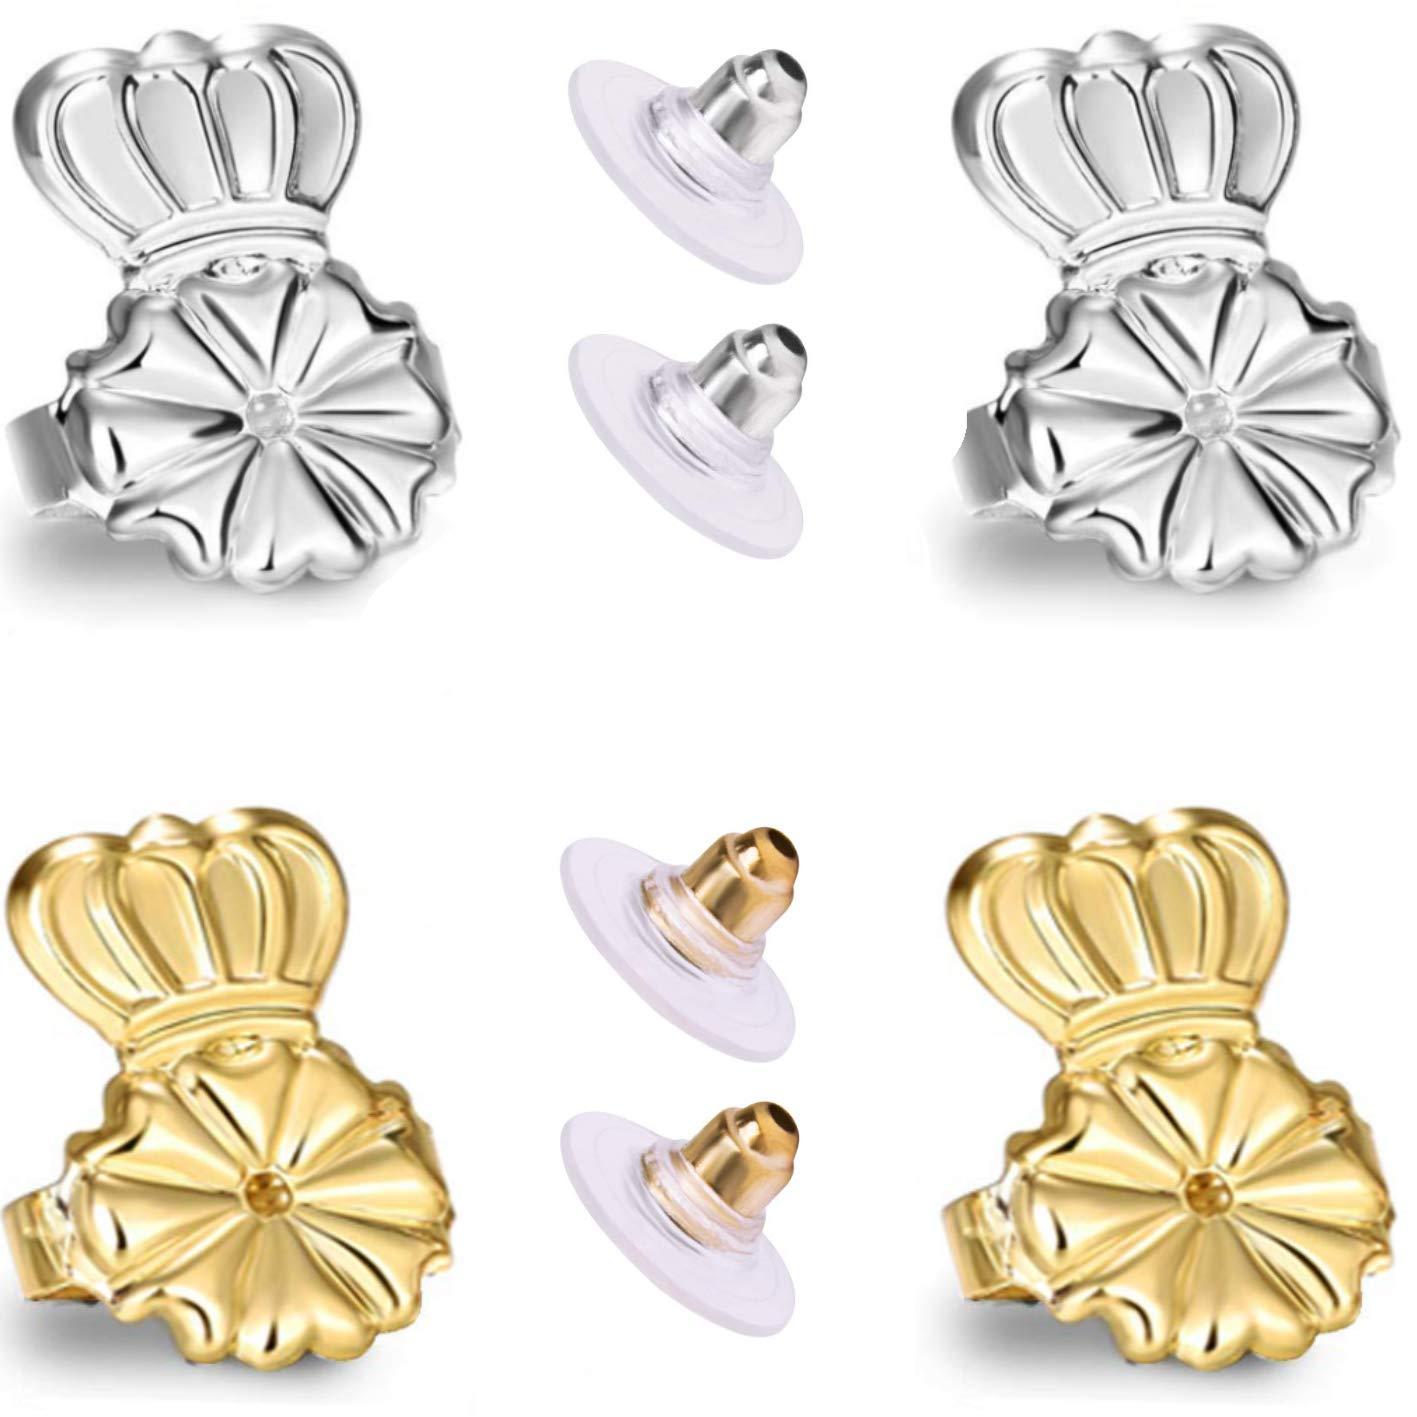 AmzonBasics - Original Magic Earring Lifters Adjustable Earring Lifts Earring Backs Bullets and Patches 2 Pairs Earring Lifters + 2 Earring Bullets Backs Gold/Silver (2 Lifters + 2 Bullets) by CROCODILOO KIDS